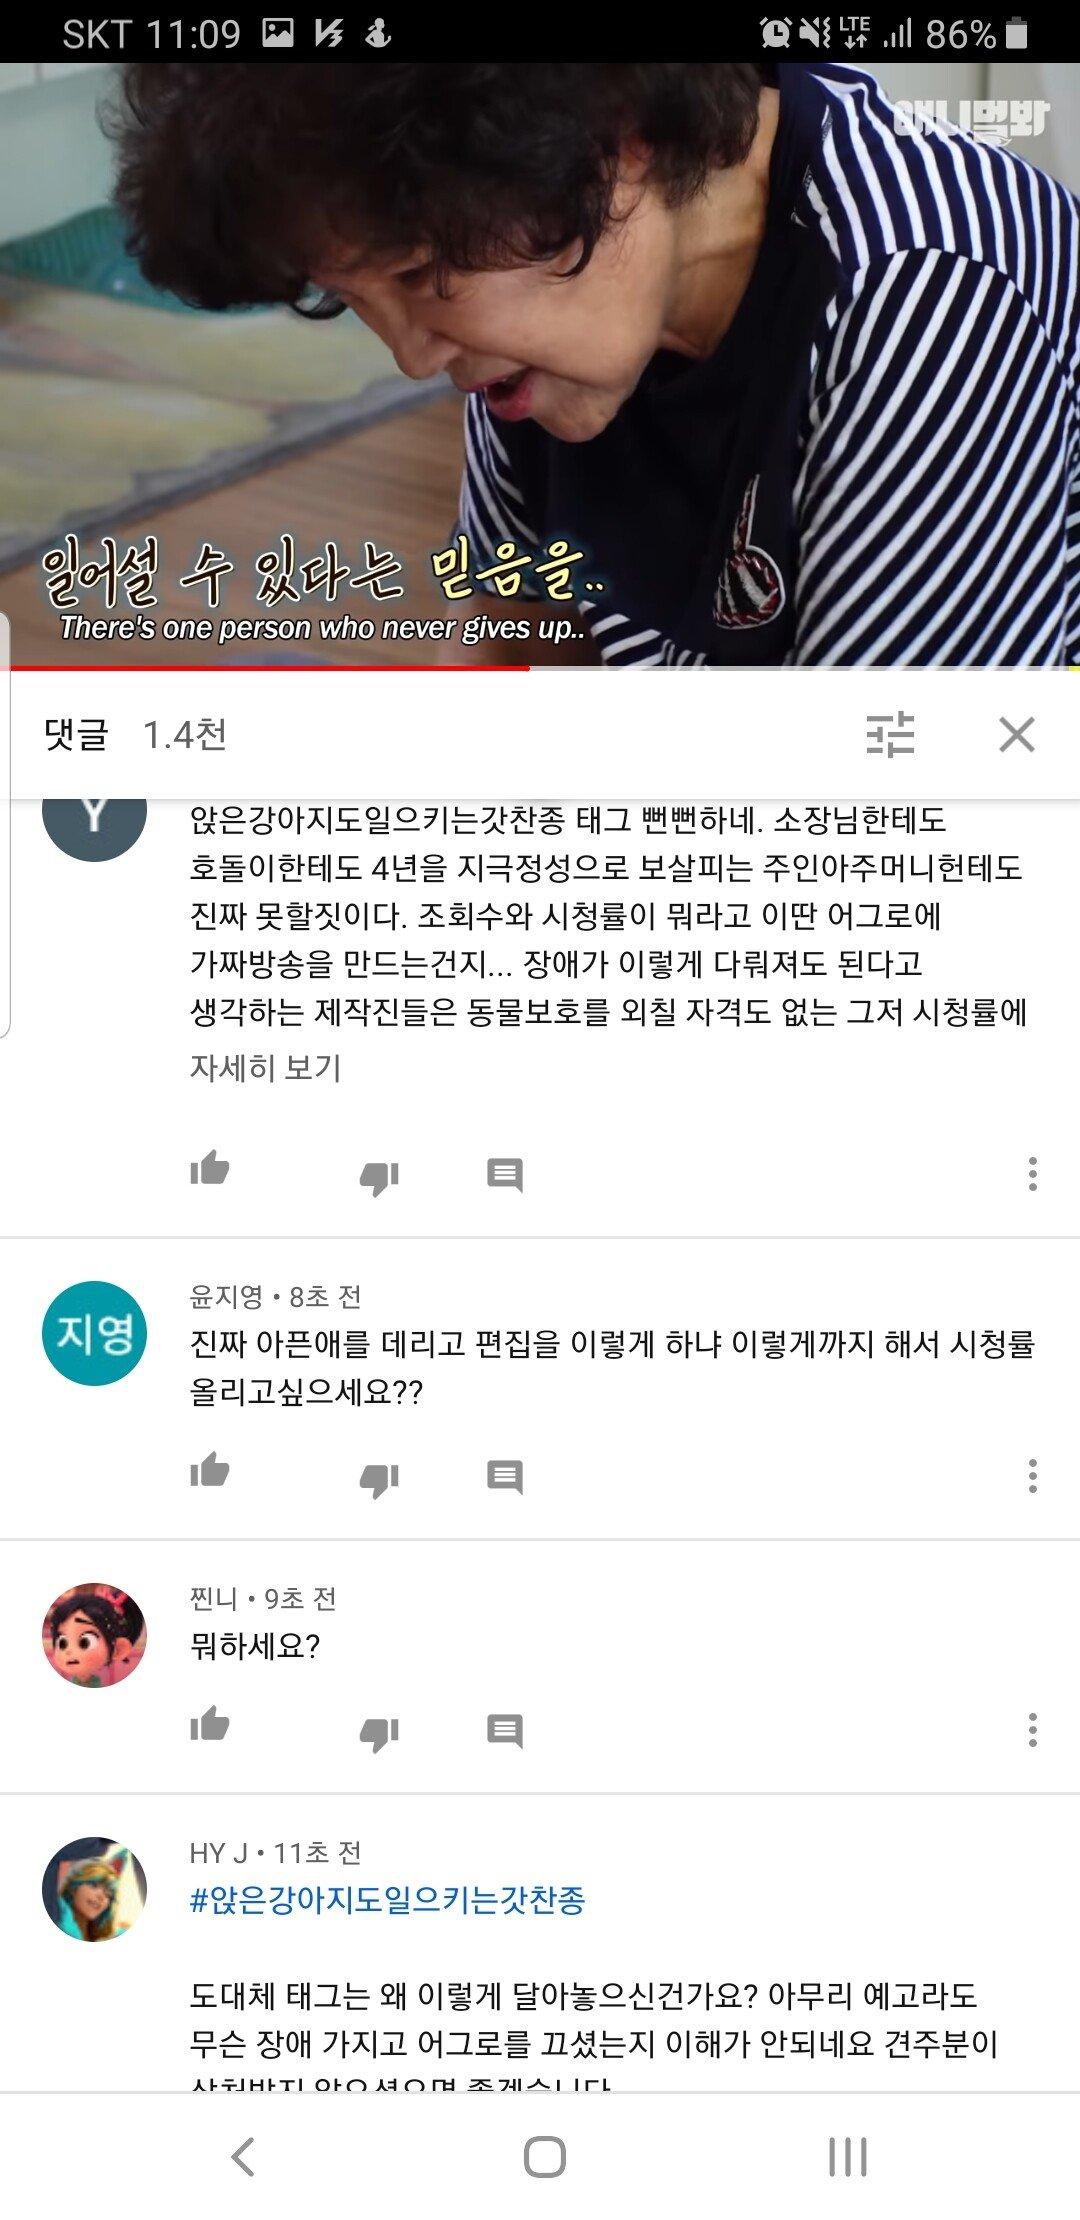 Screenshot_20200802-110927_YouTube.jpg 4년간 걷지못하는 개 호돌이 본방 후 상황